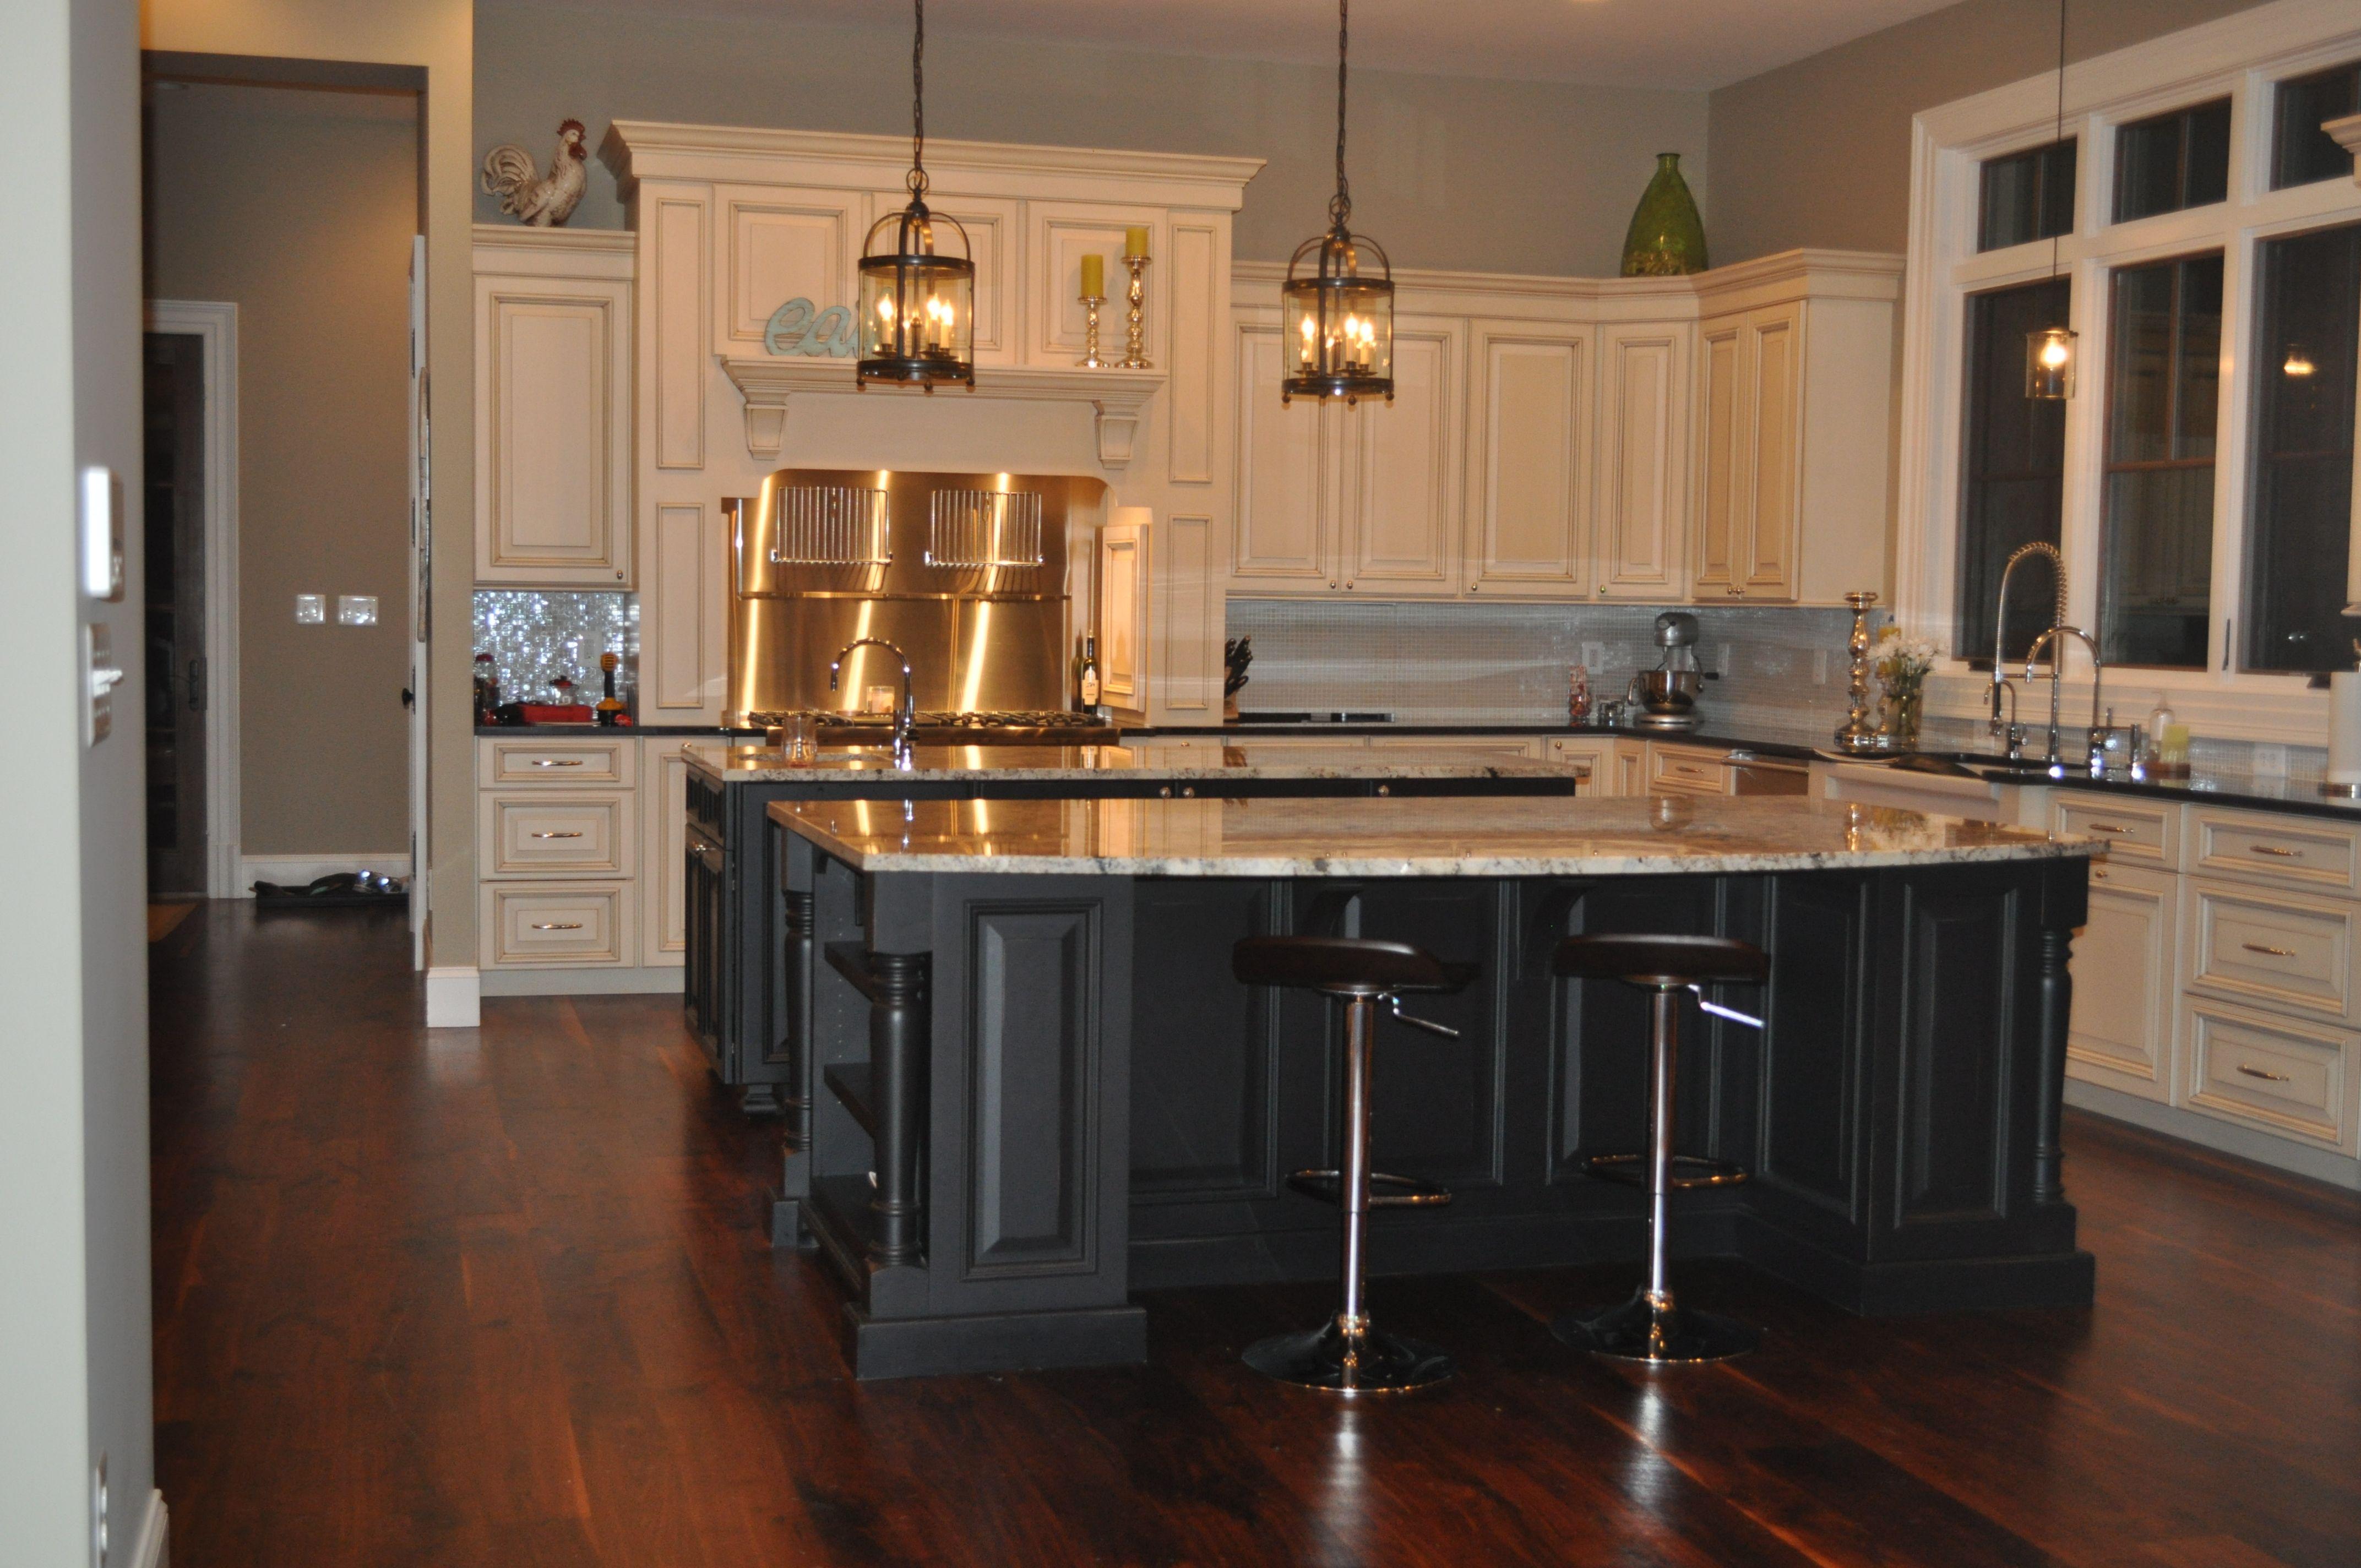 Best My Current Kitchen With Double Islands White Kitchen 400 x 300